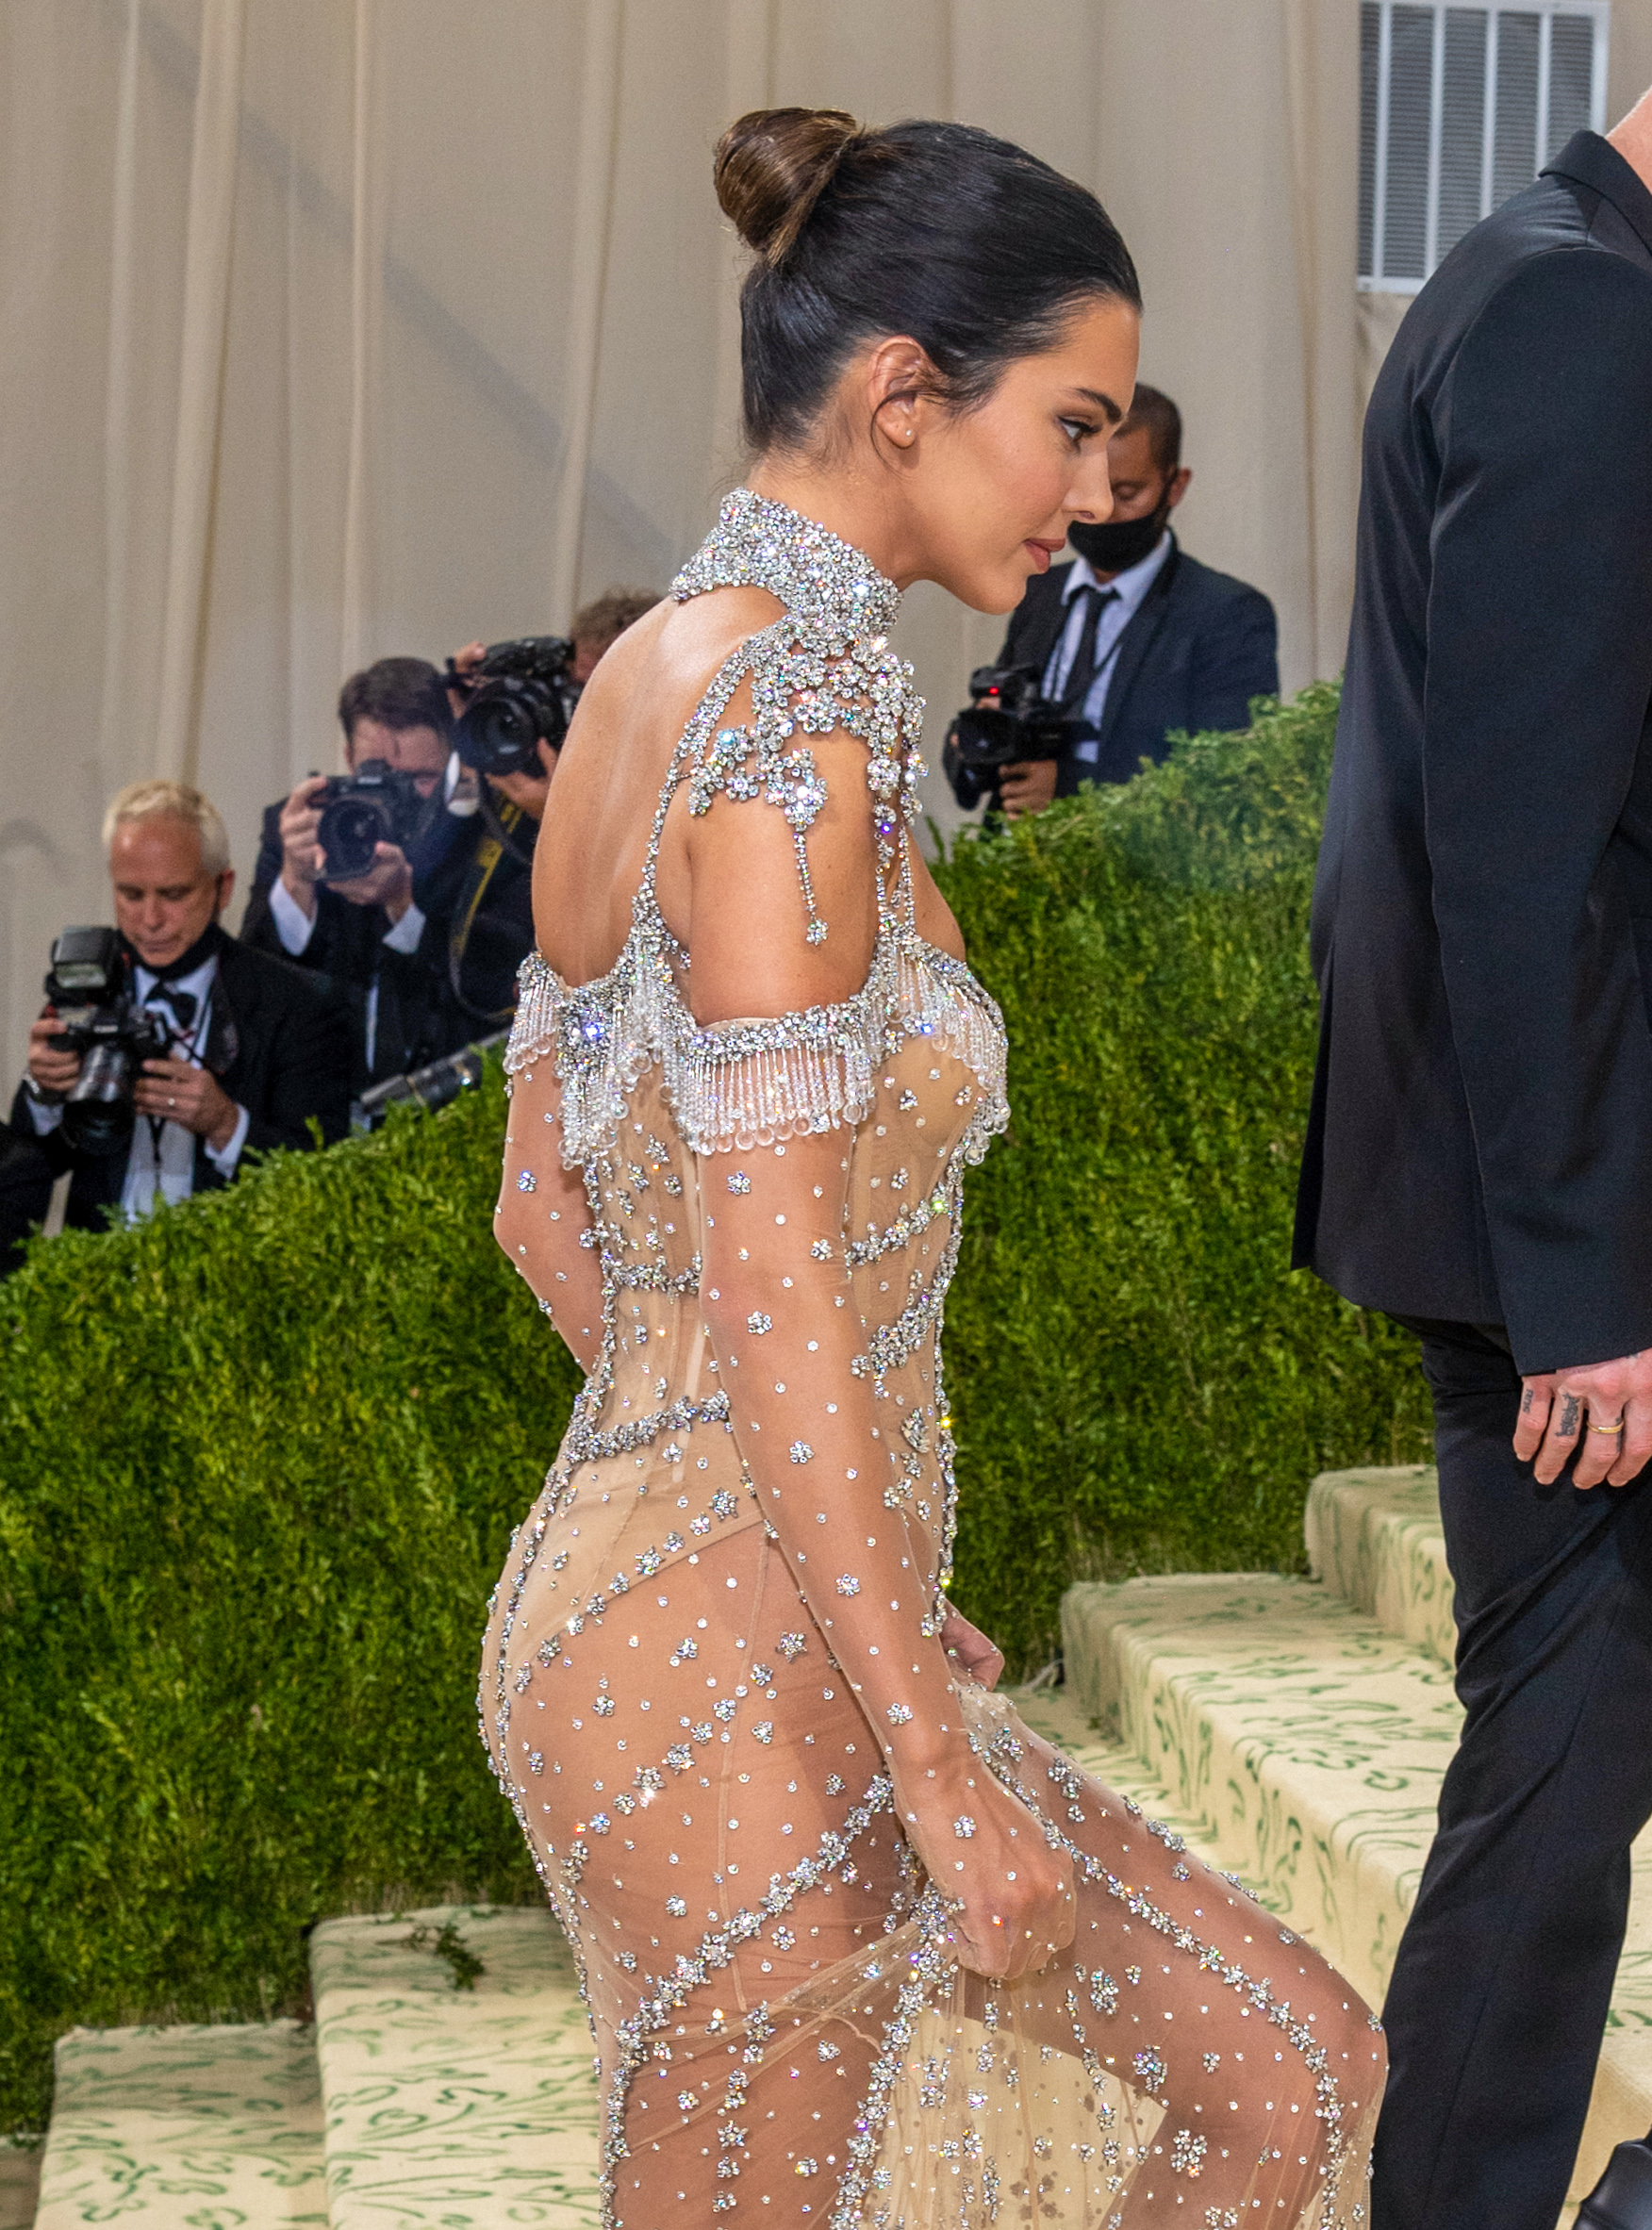 Kendall Jenner New York (Photo Credit: Ron Adar/M10s / SplashNews.com)